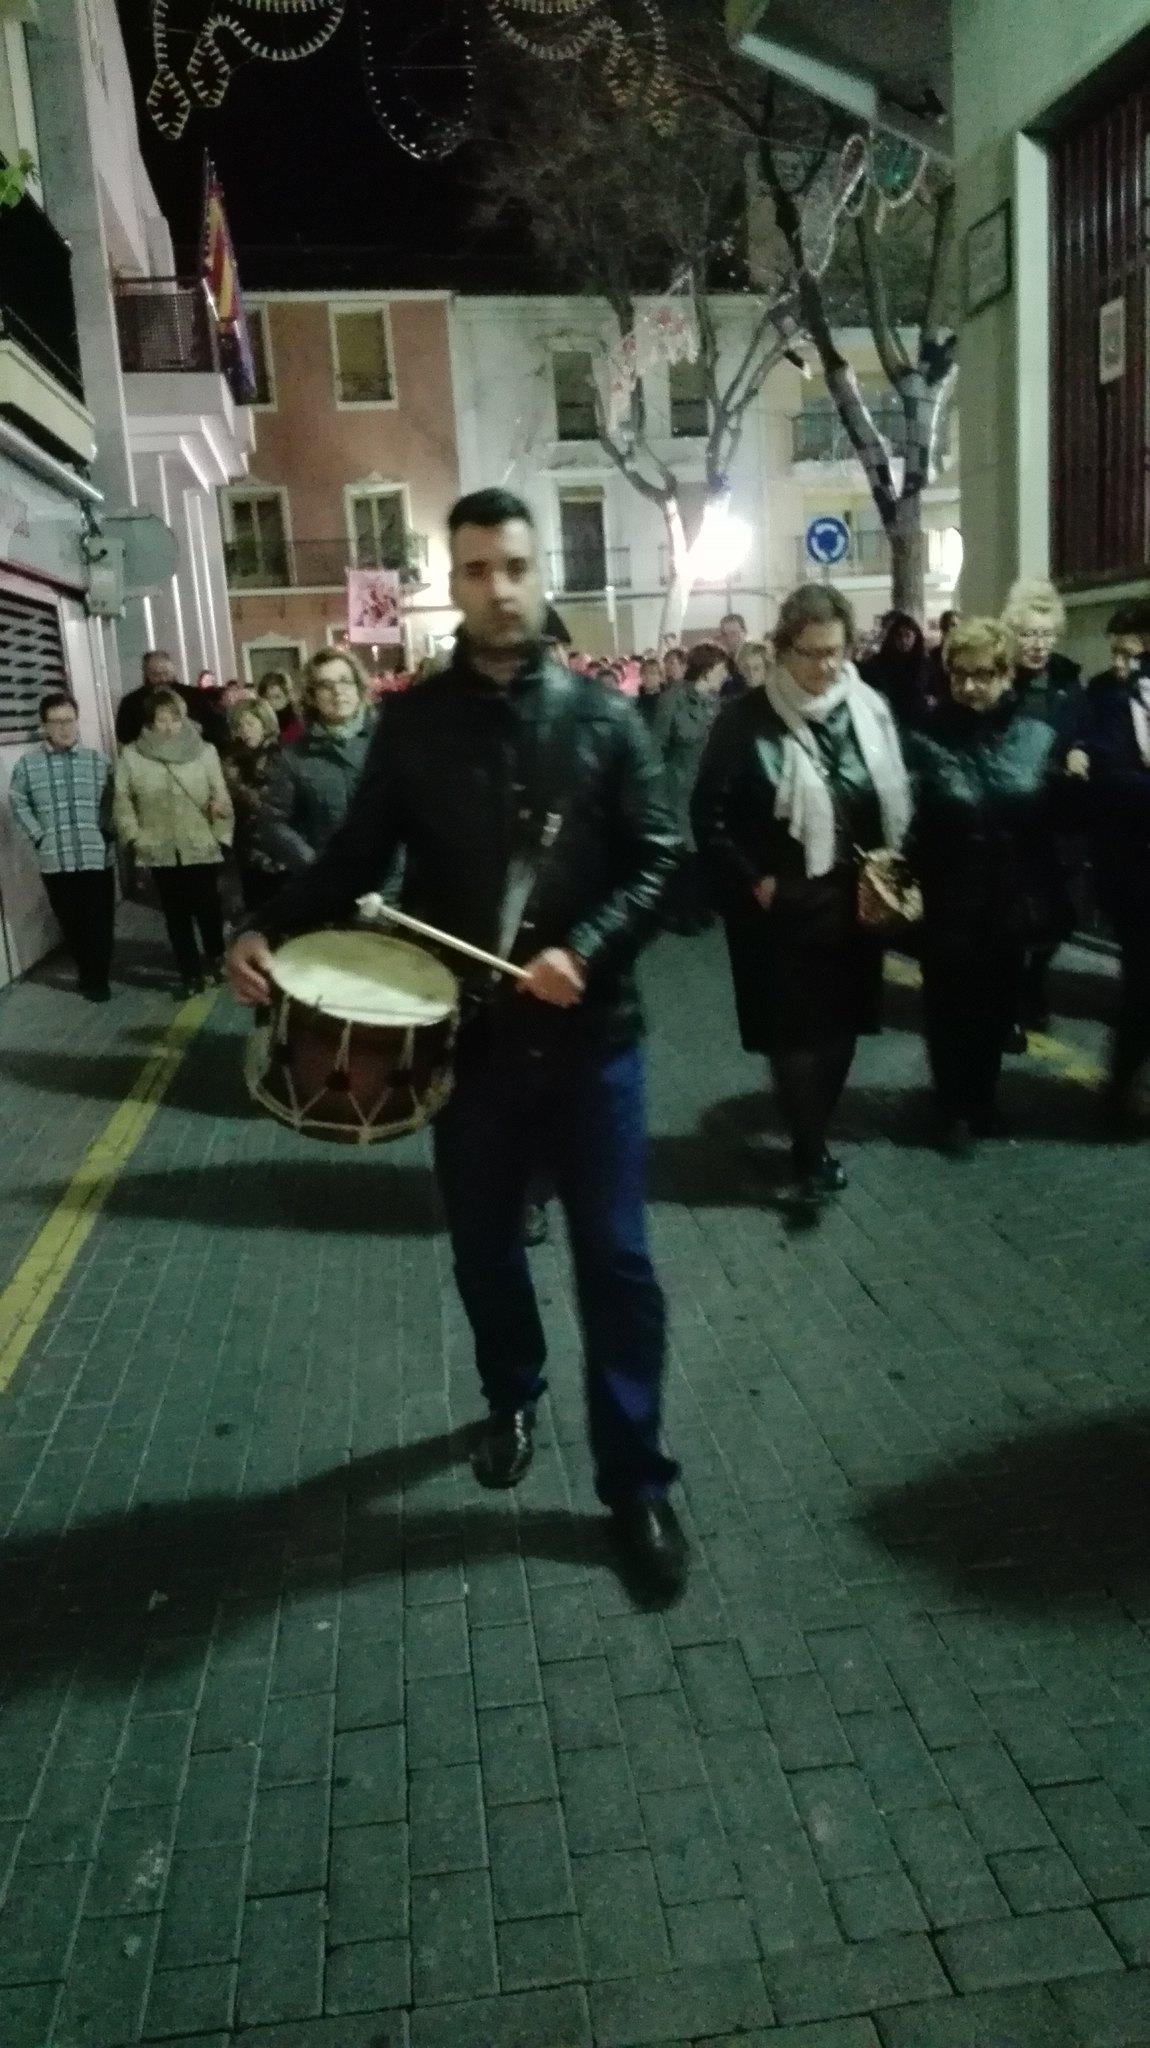 (2016-03-18) - VII Vía Crucis nocturno - Javier Romero Ripoll (077)